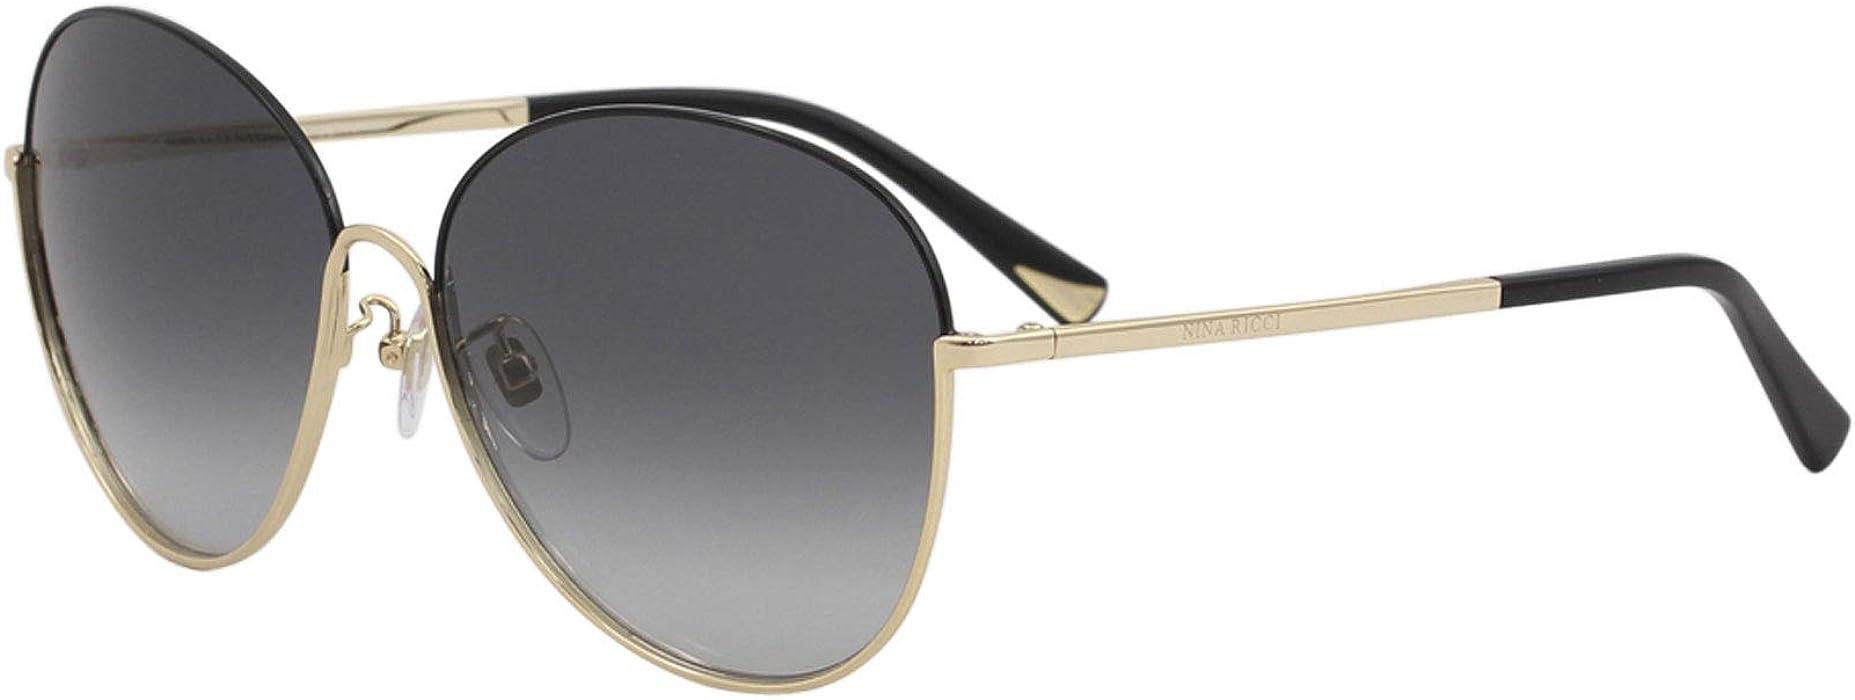 8010441258 Sunglasses Nina Ricci SNR 061 Black Gold 301 at Amazon Men s ...